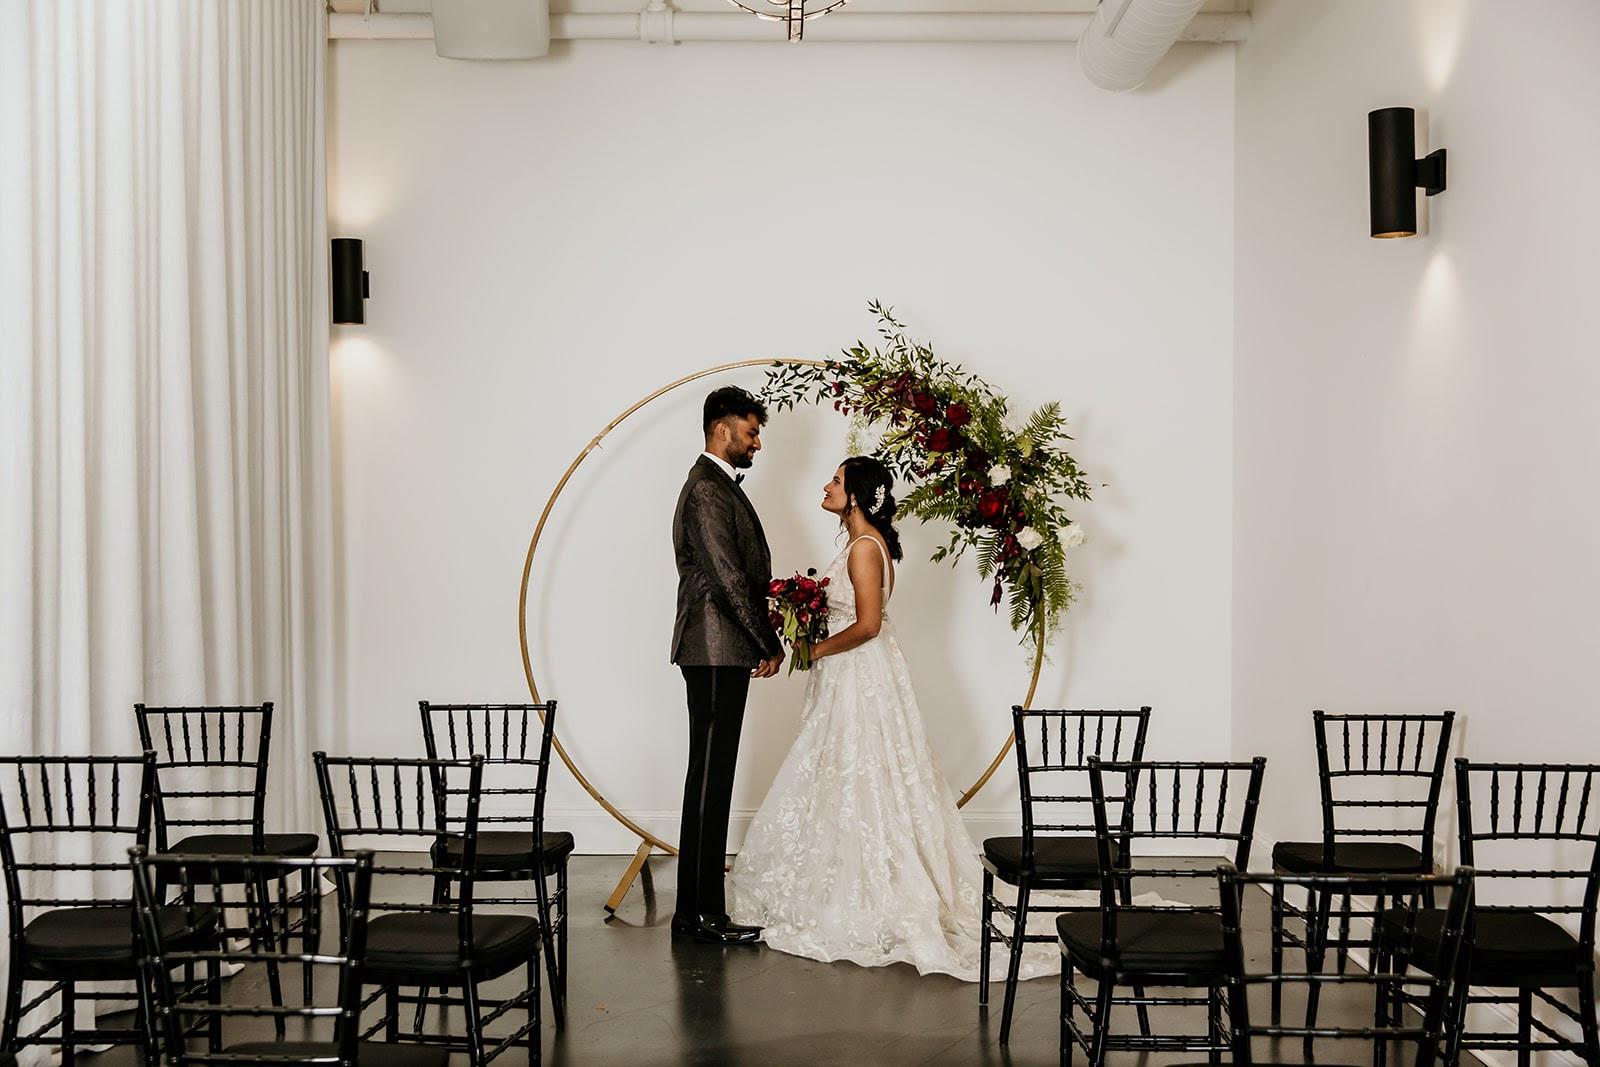 Indoor wedding ceremony with black chairs